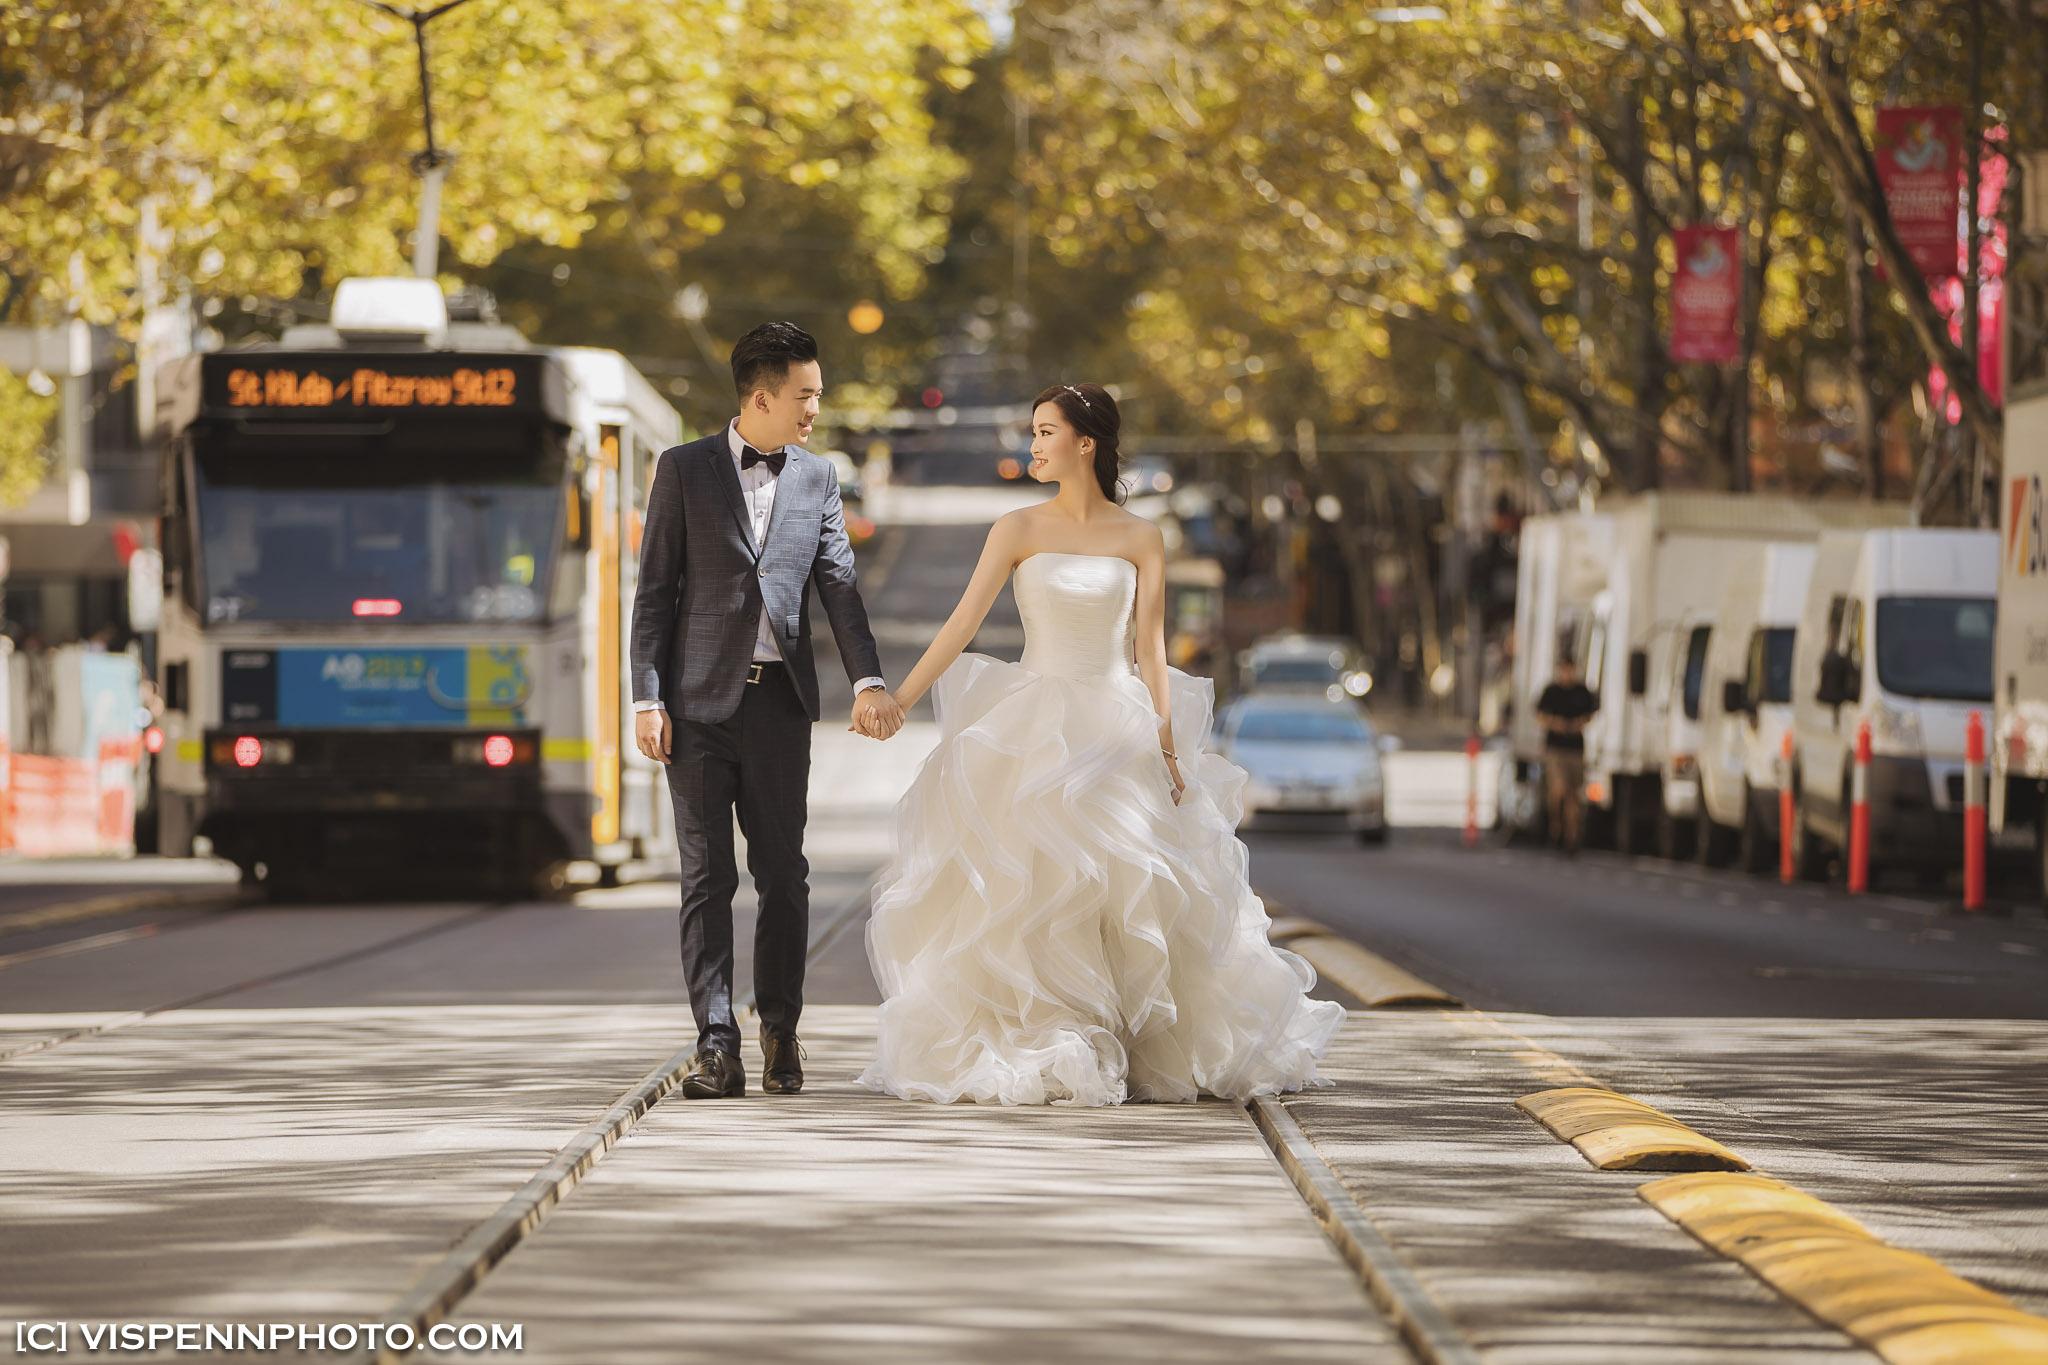 PRE WEDDING Photography Melbourne VISPENN 墨尔本 婚纱照 结婚照 婚纱摄影 AndyCHEN 2796 1DX VISPENN